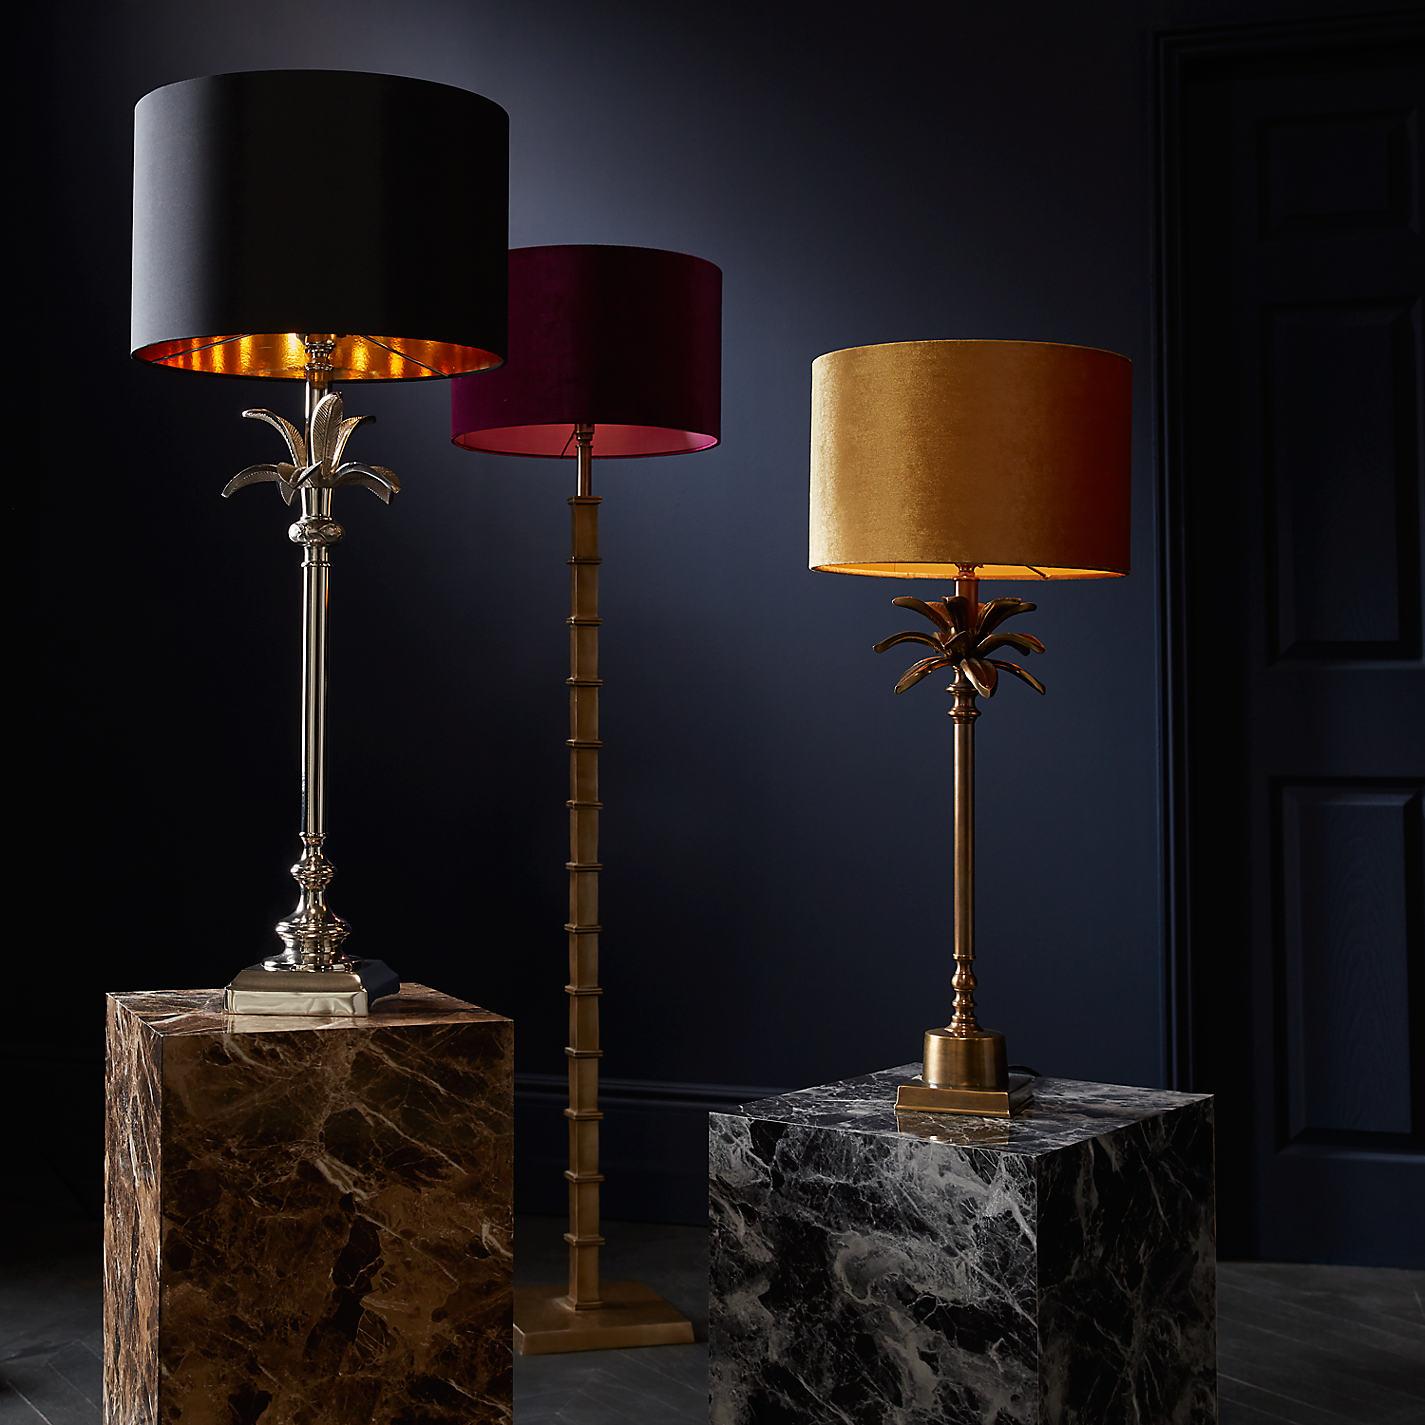 ... Buy John Lewis Jude Floor Lamp Base, Antique Brass Online at  johnlewis.com ...